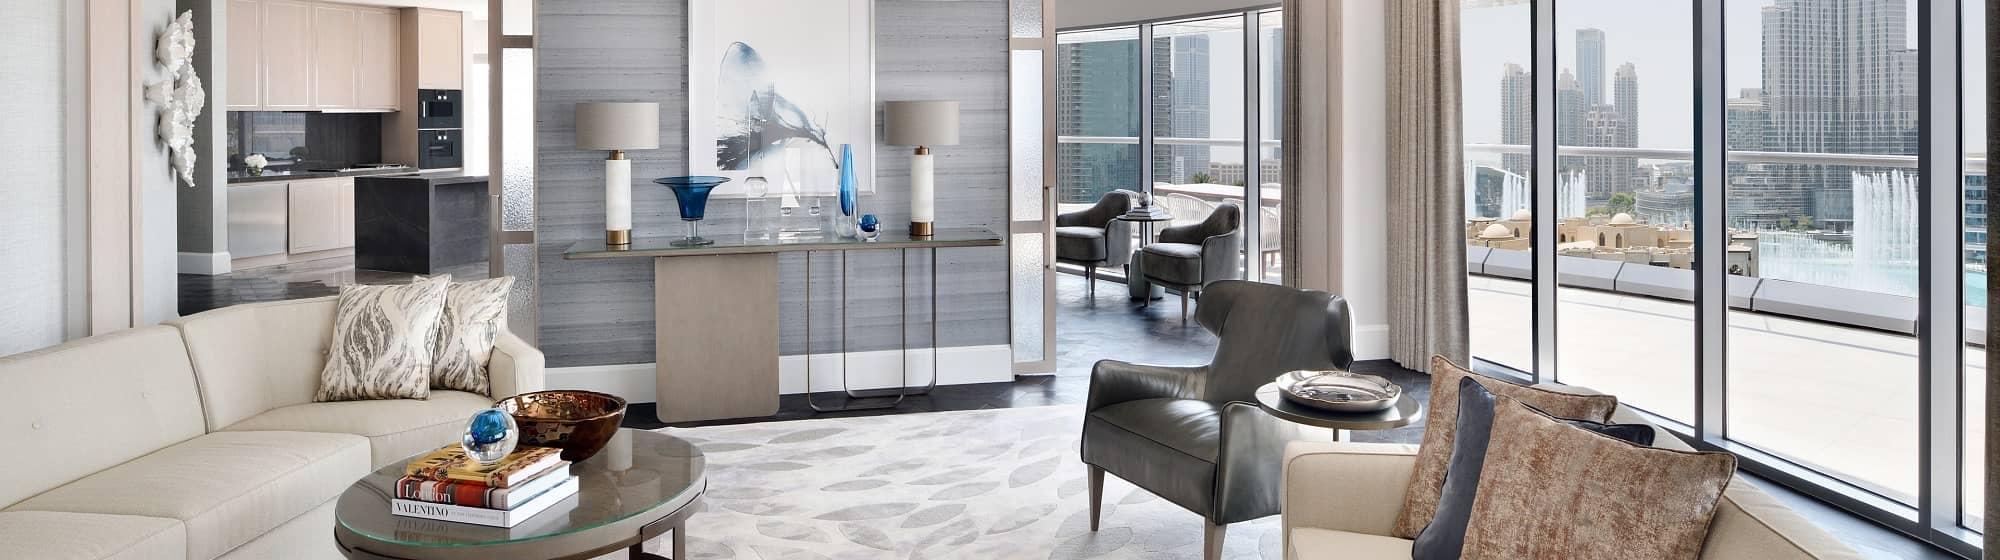 20 Luxury 5BR APT | Sky View Bridge Tower For Sale